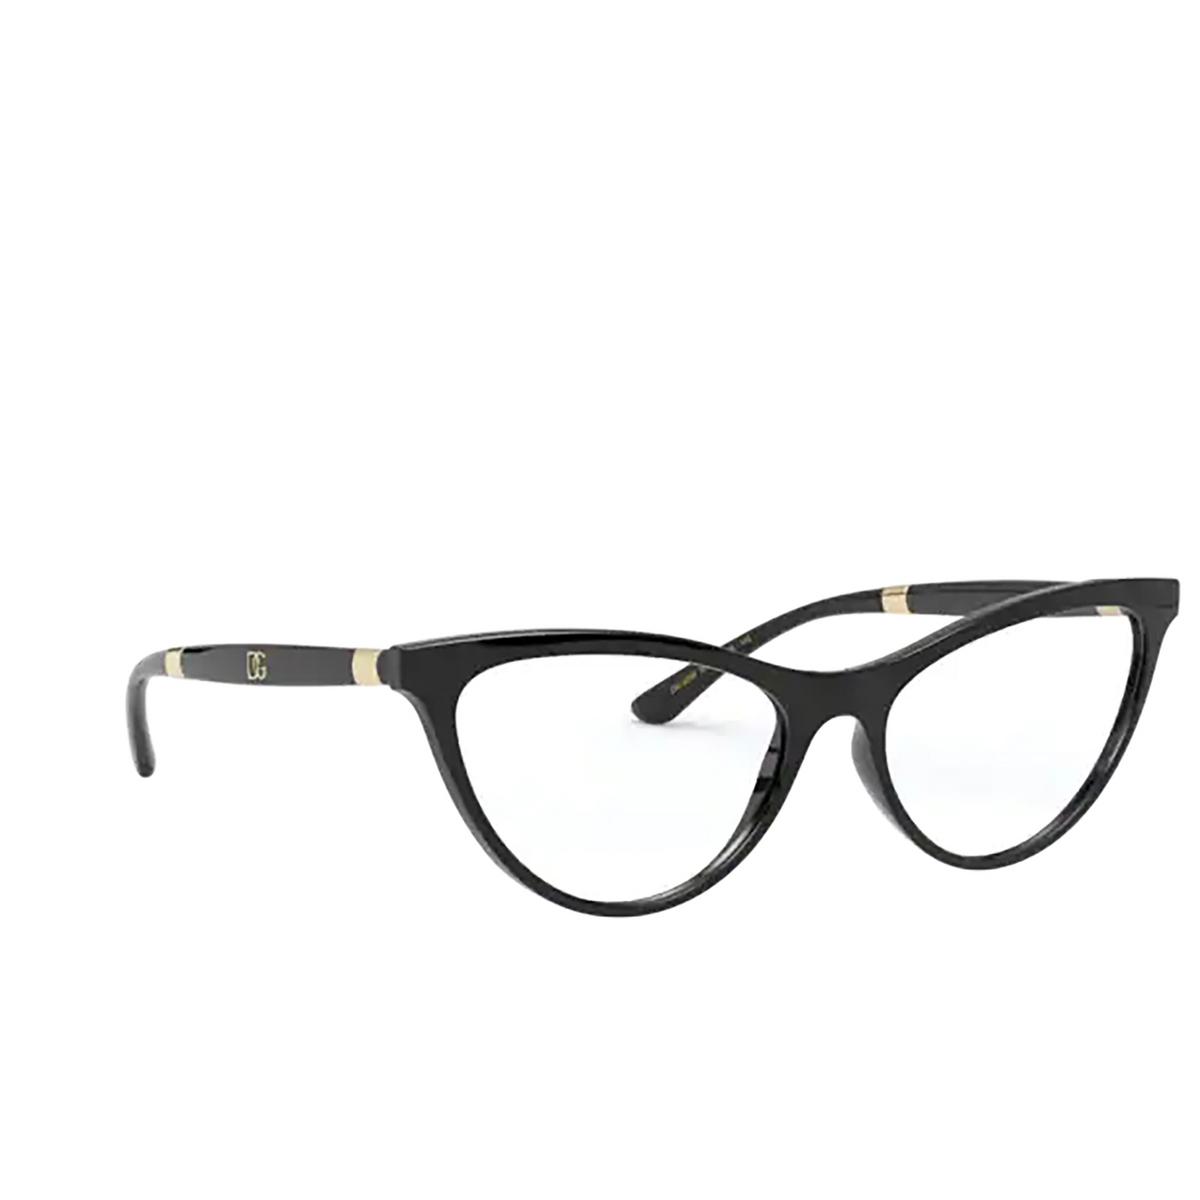 Dolce & Gabbana® Cat-eye Eyeglasses: DG5058 color Black 501 - three-quarters view.